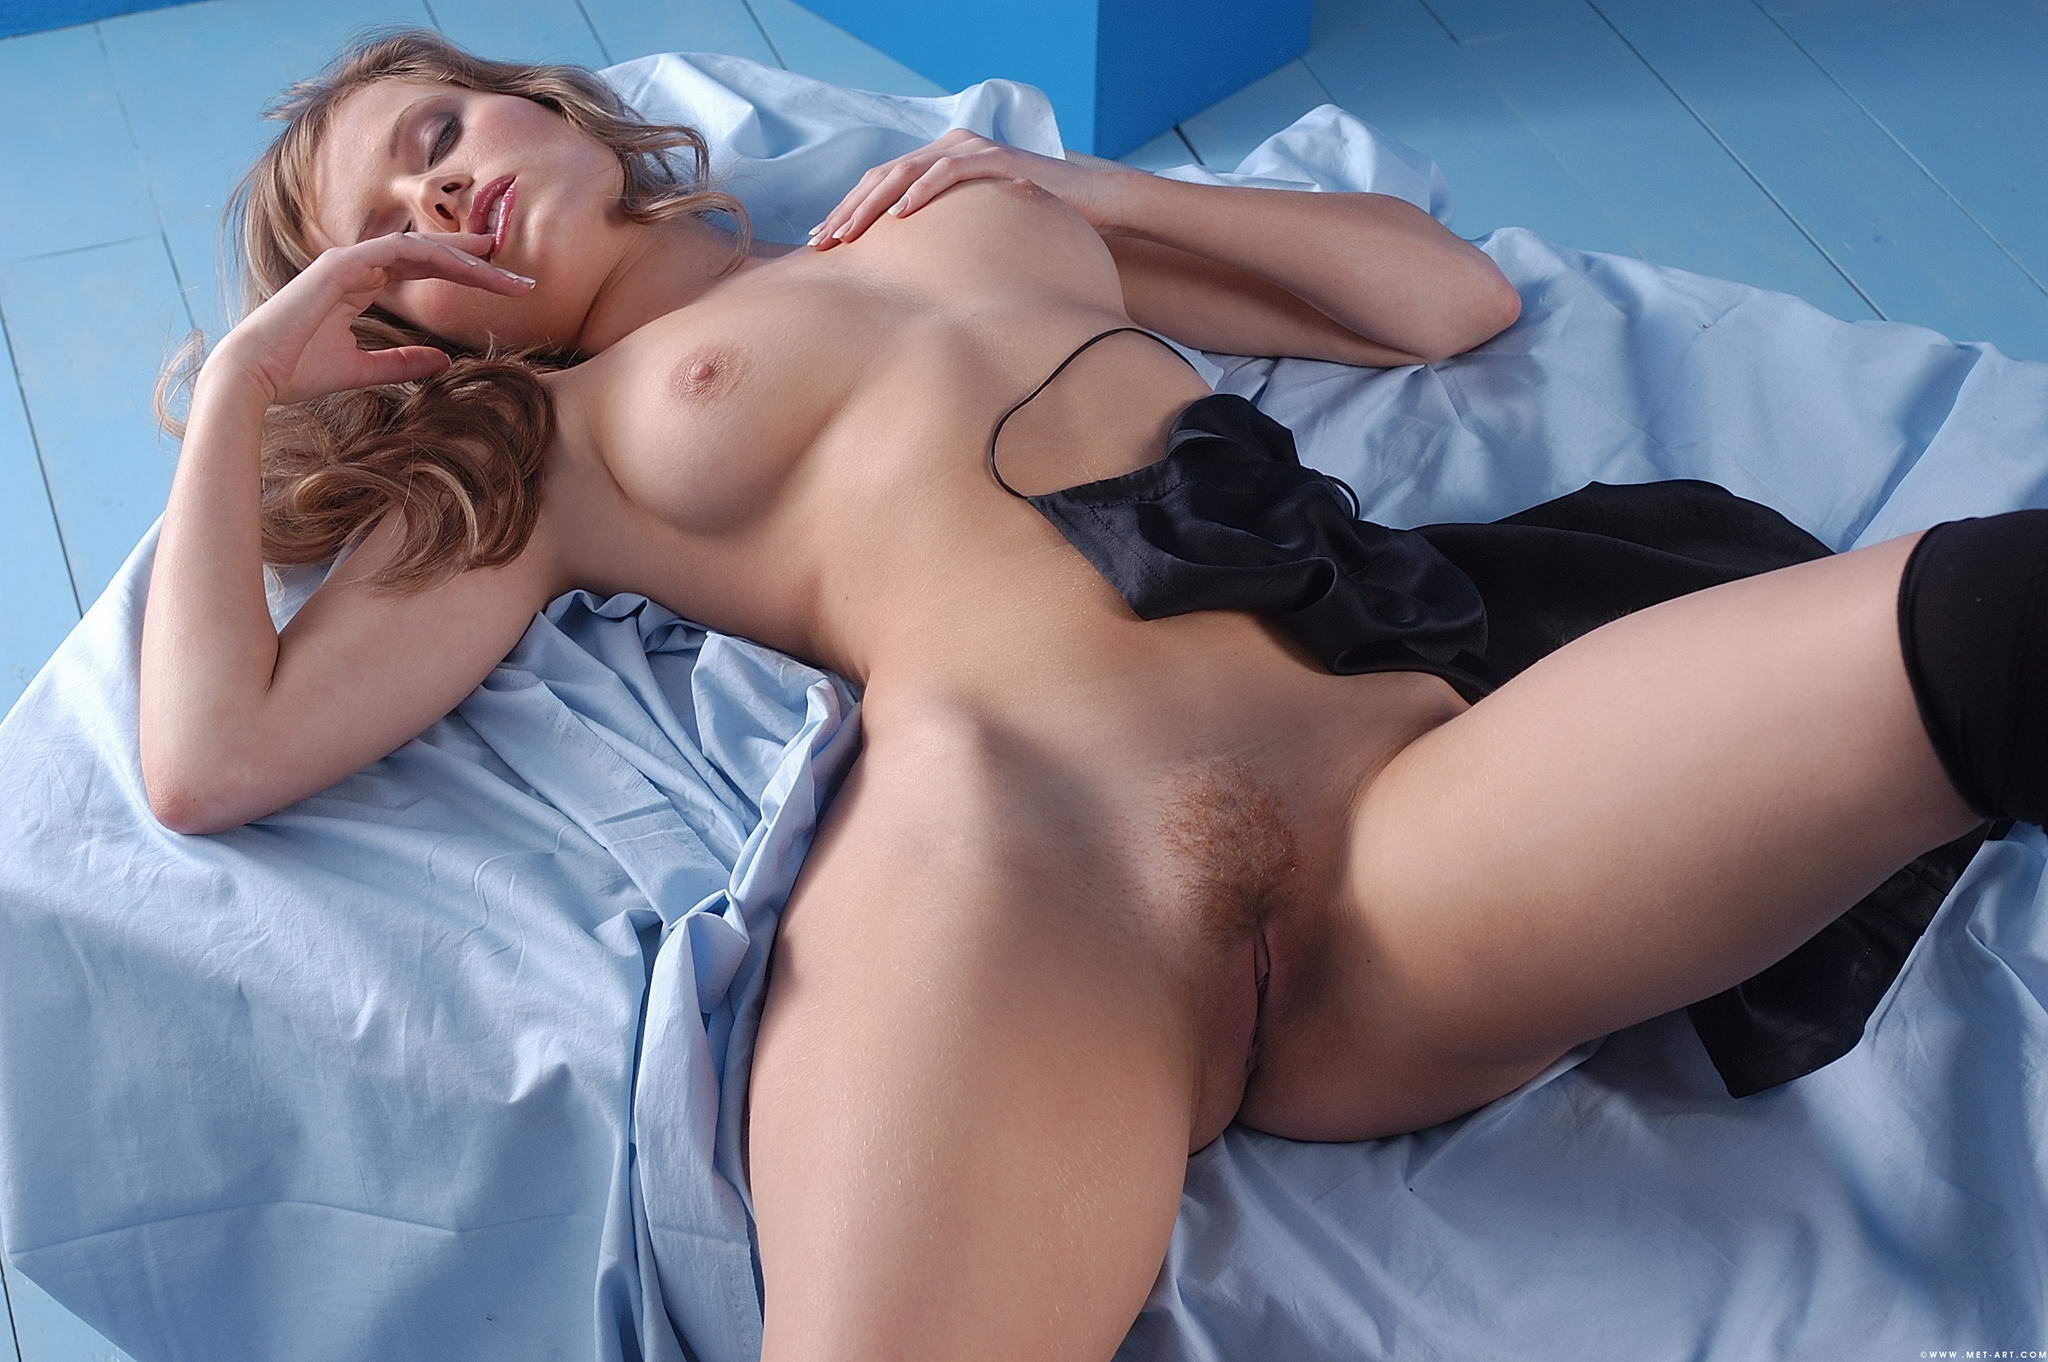 How long should penetration last